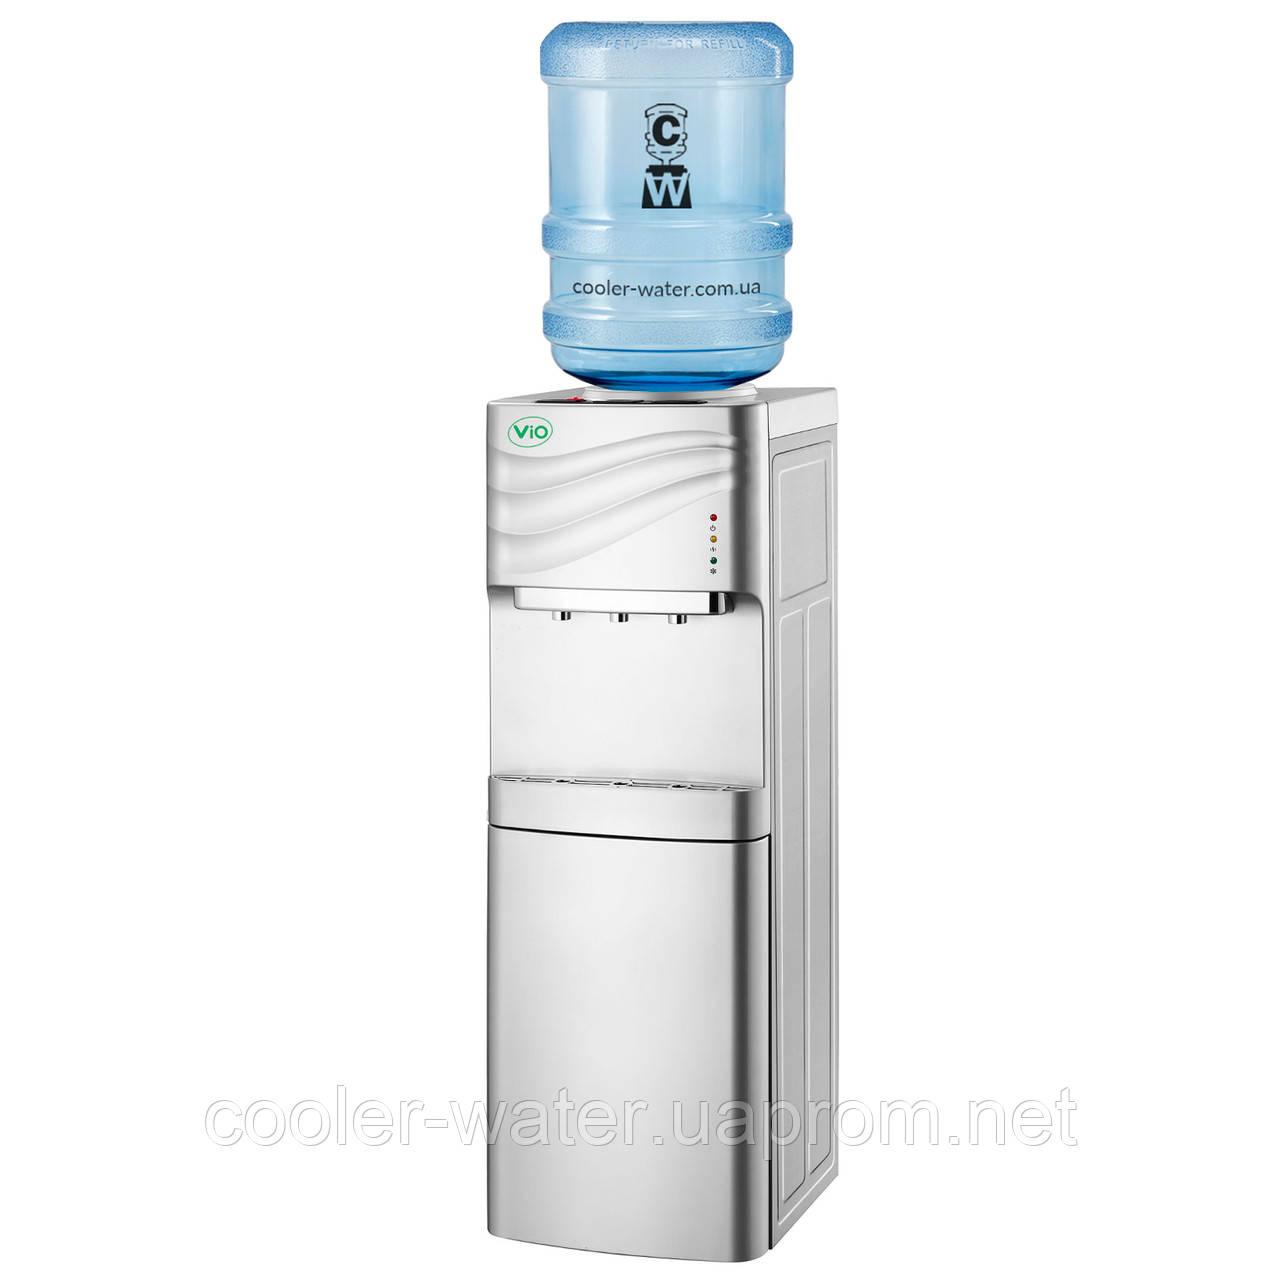 Кулер для воды ViO X-903 FEC Silver со шкафчиком